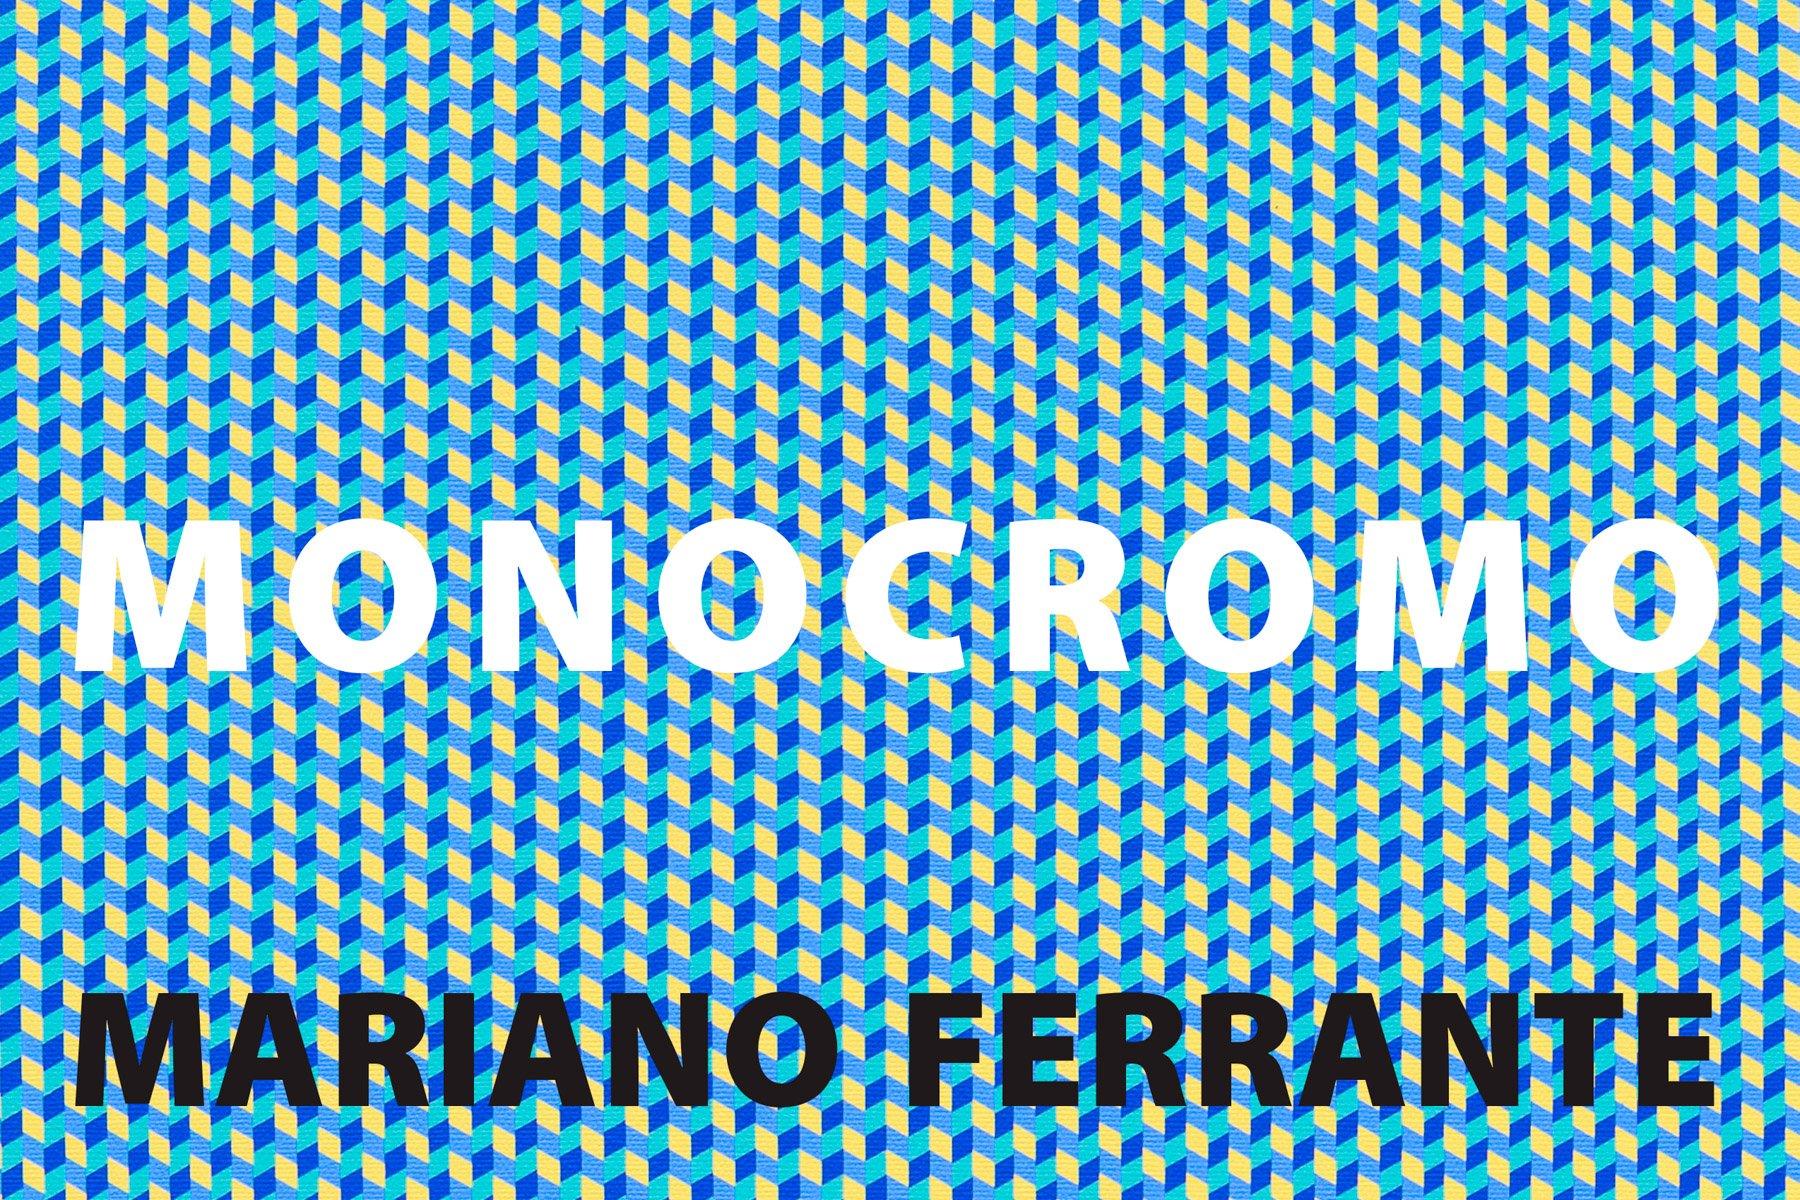 2021-MarianoFerrante-Monocromo